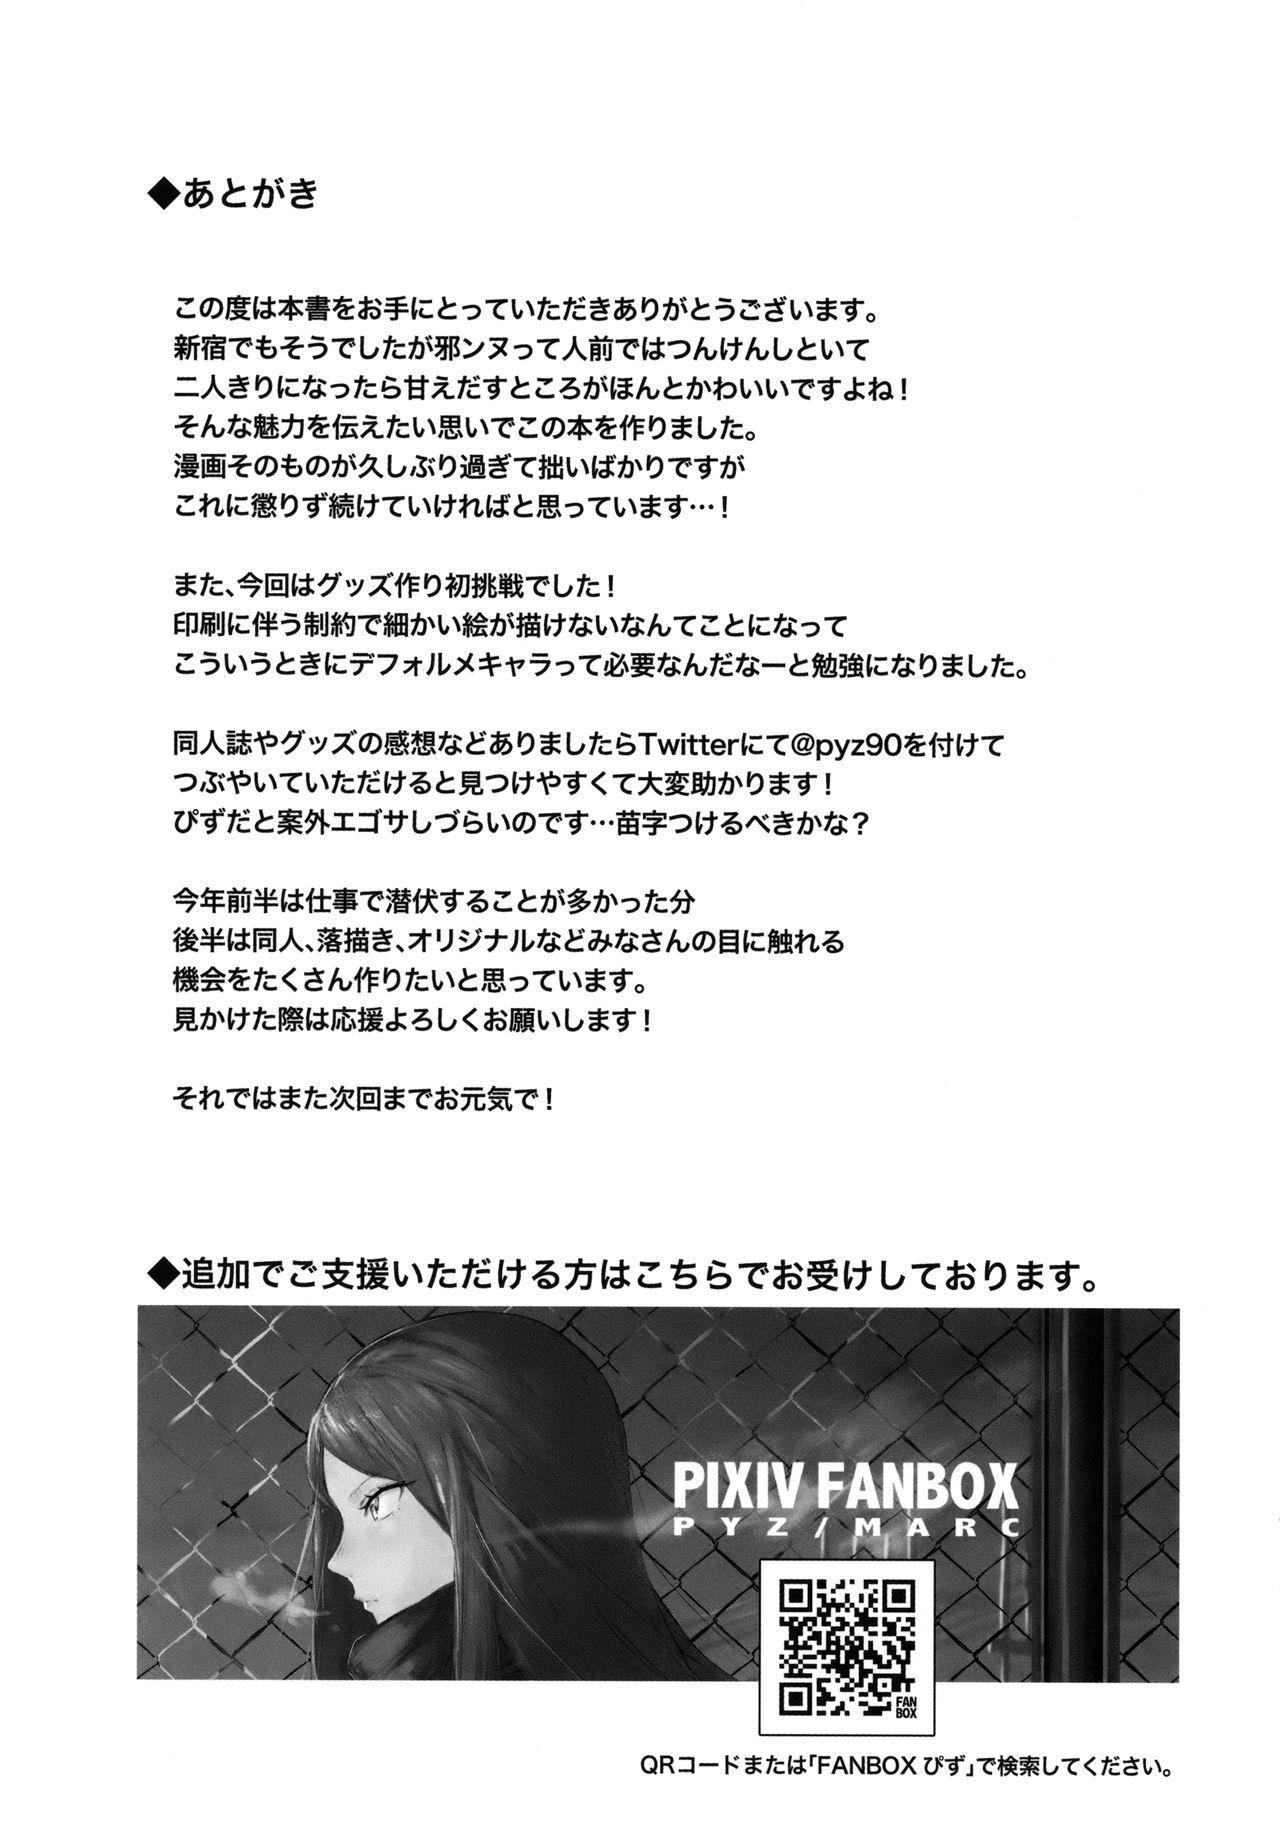 Jeanne to Nakayoshi Mujintou Seikatsu | My daily life on an uninhabited island with Jeanne. 19